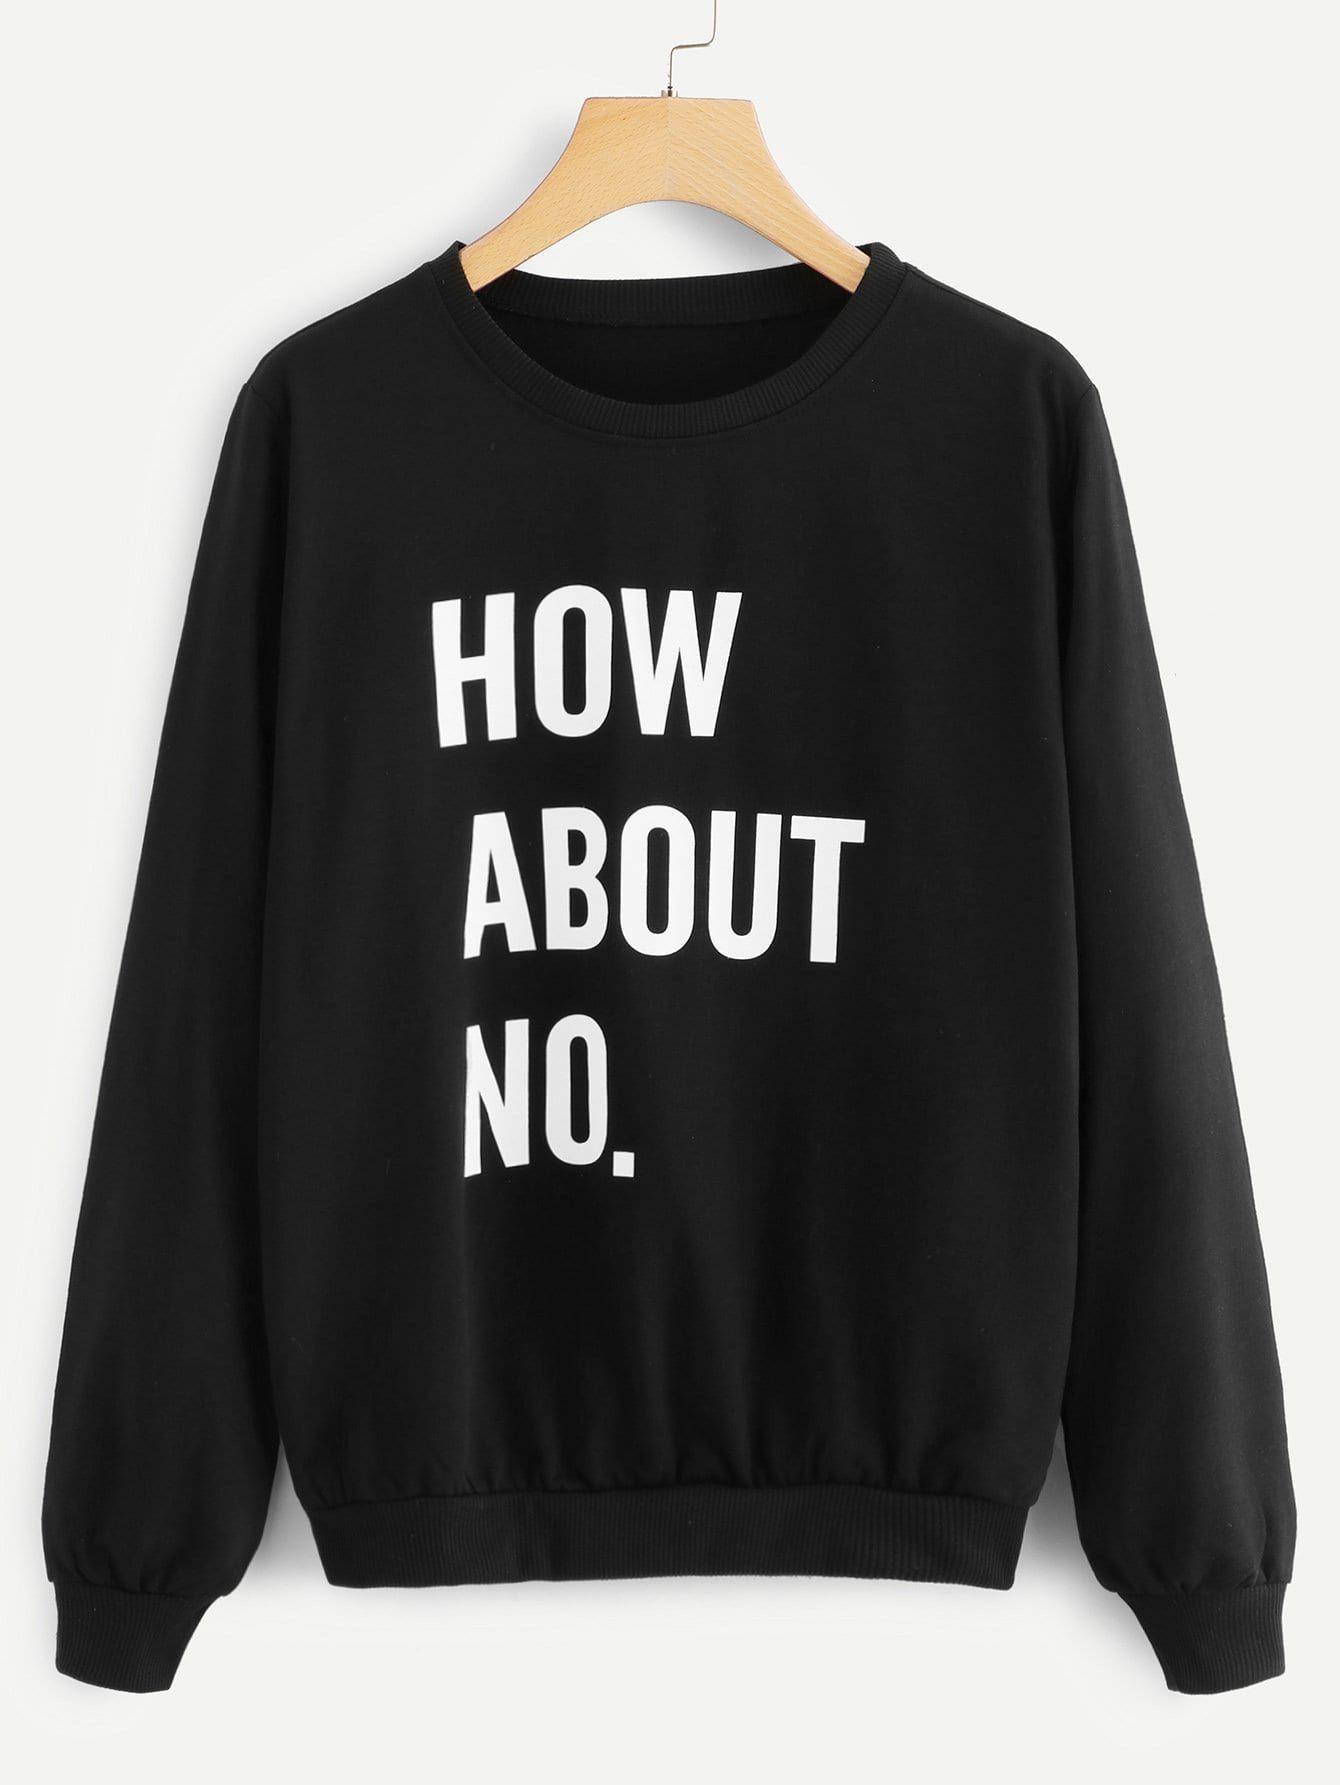 Letter Print Sweatshirtfor Women Romwe Printed Sweatshirts Sarcastic Clothing Funny Sweaters [ 1785 x 1340 Pixel ]